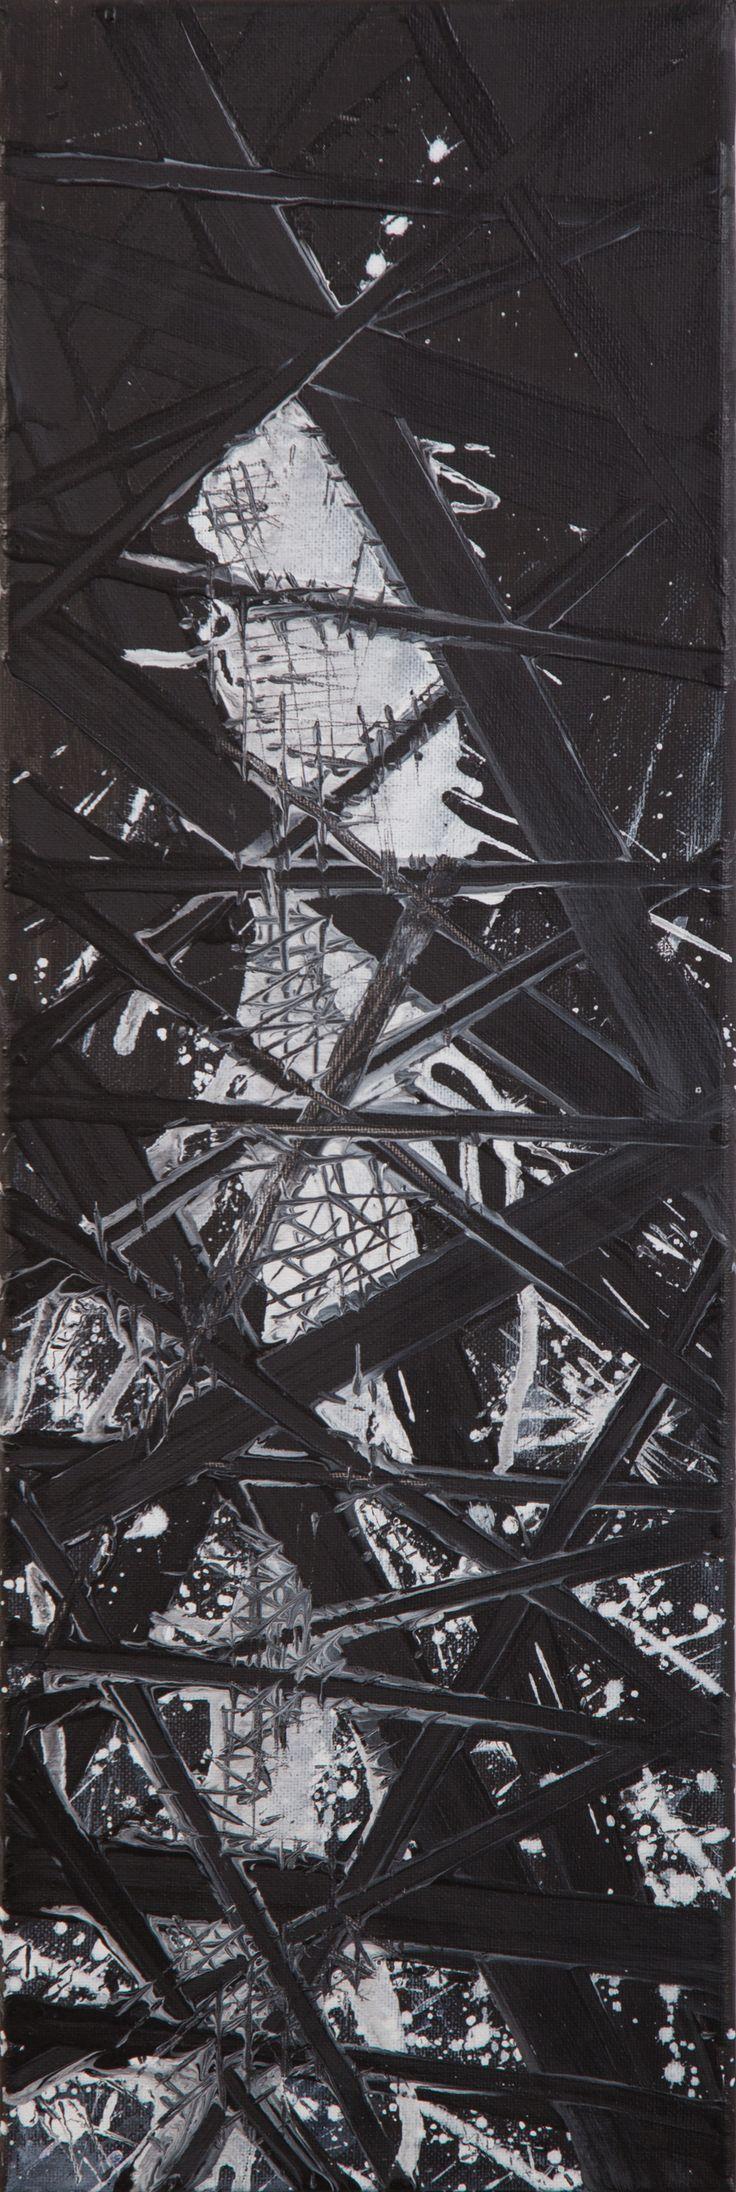 'Shadows nights' Acrylic on canvas 20/60cm (2015) Created by Anda Anastasopoulou  https://www.facebook.com/Andapainting2015  Anda Anastasopoulou - Google+ https://plus.google.com/104006191383272659096